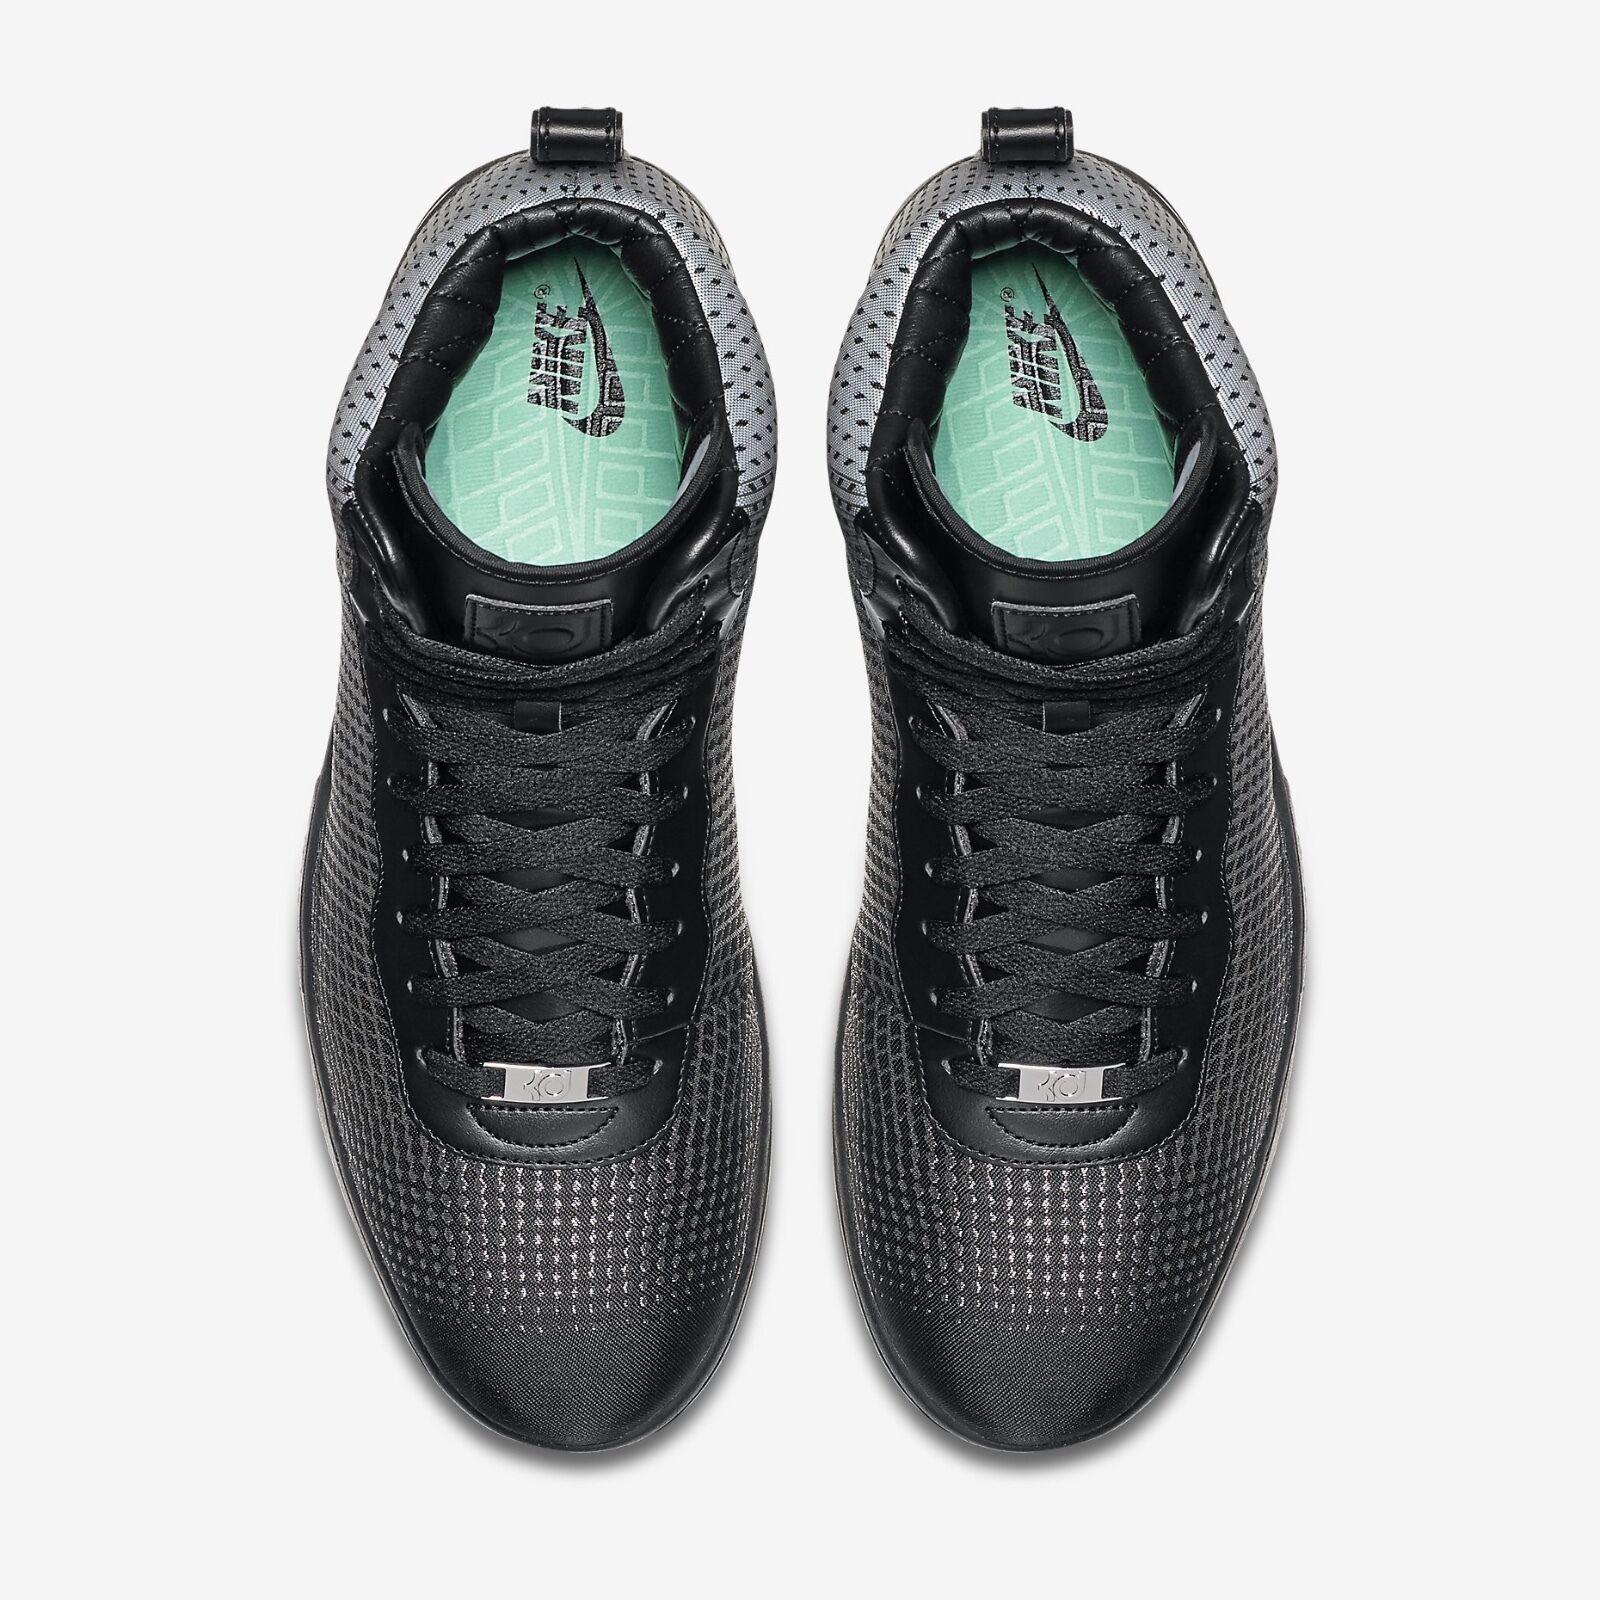 Nike Buio Donne Nike Flex 2018 Rn Aa7408-002 Nero / Buio Nike Grey-Anthracite Misura 6,5 0b0567